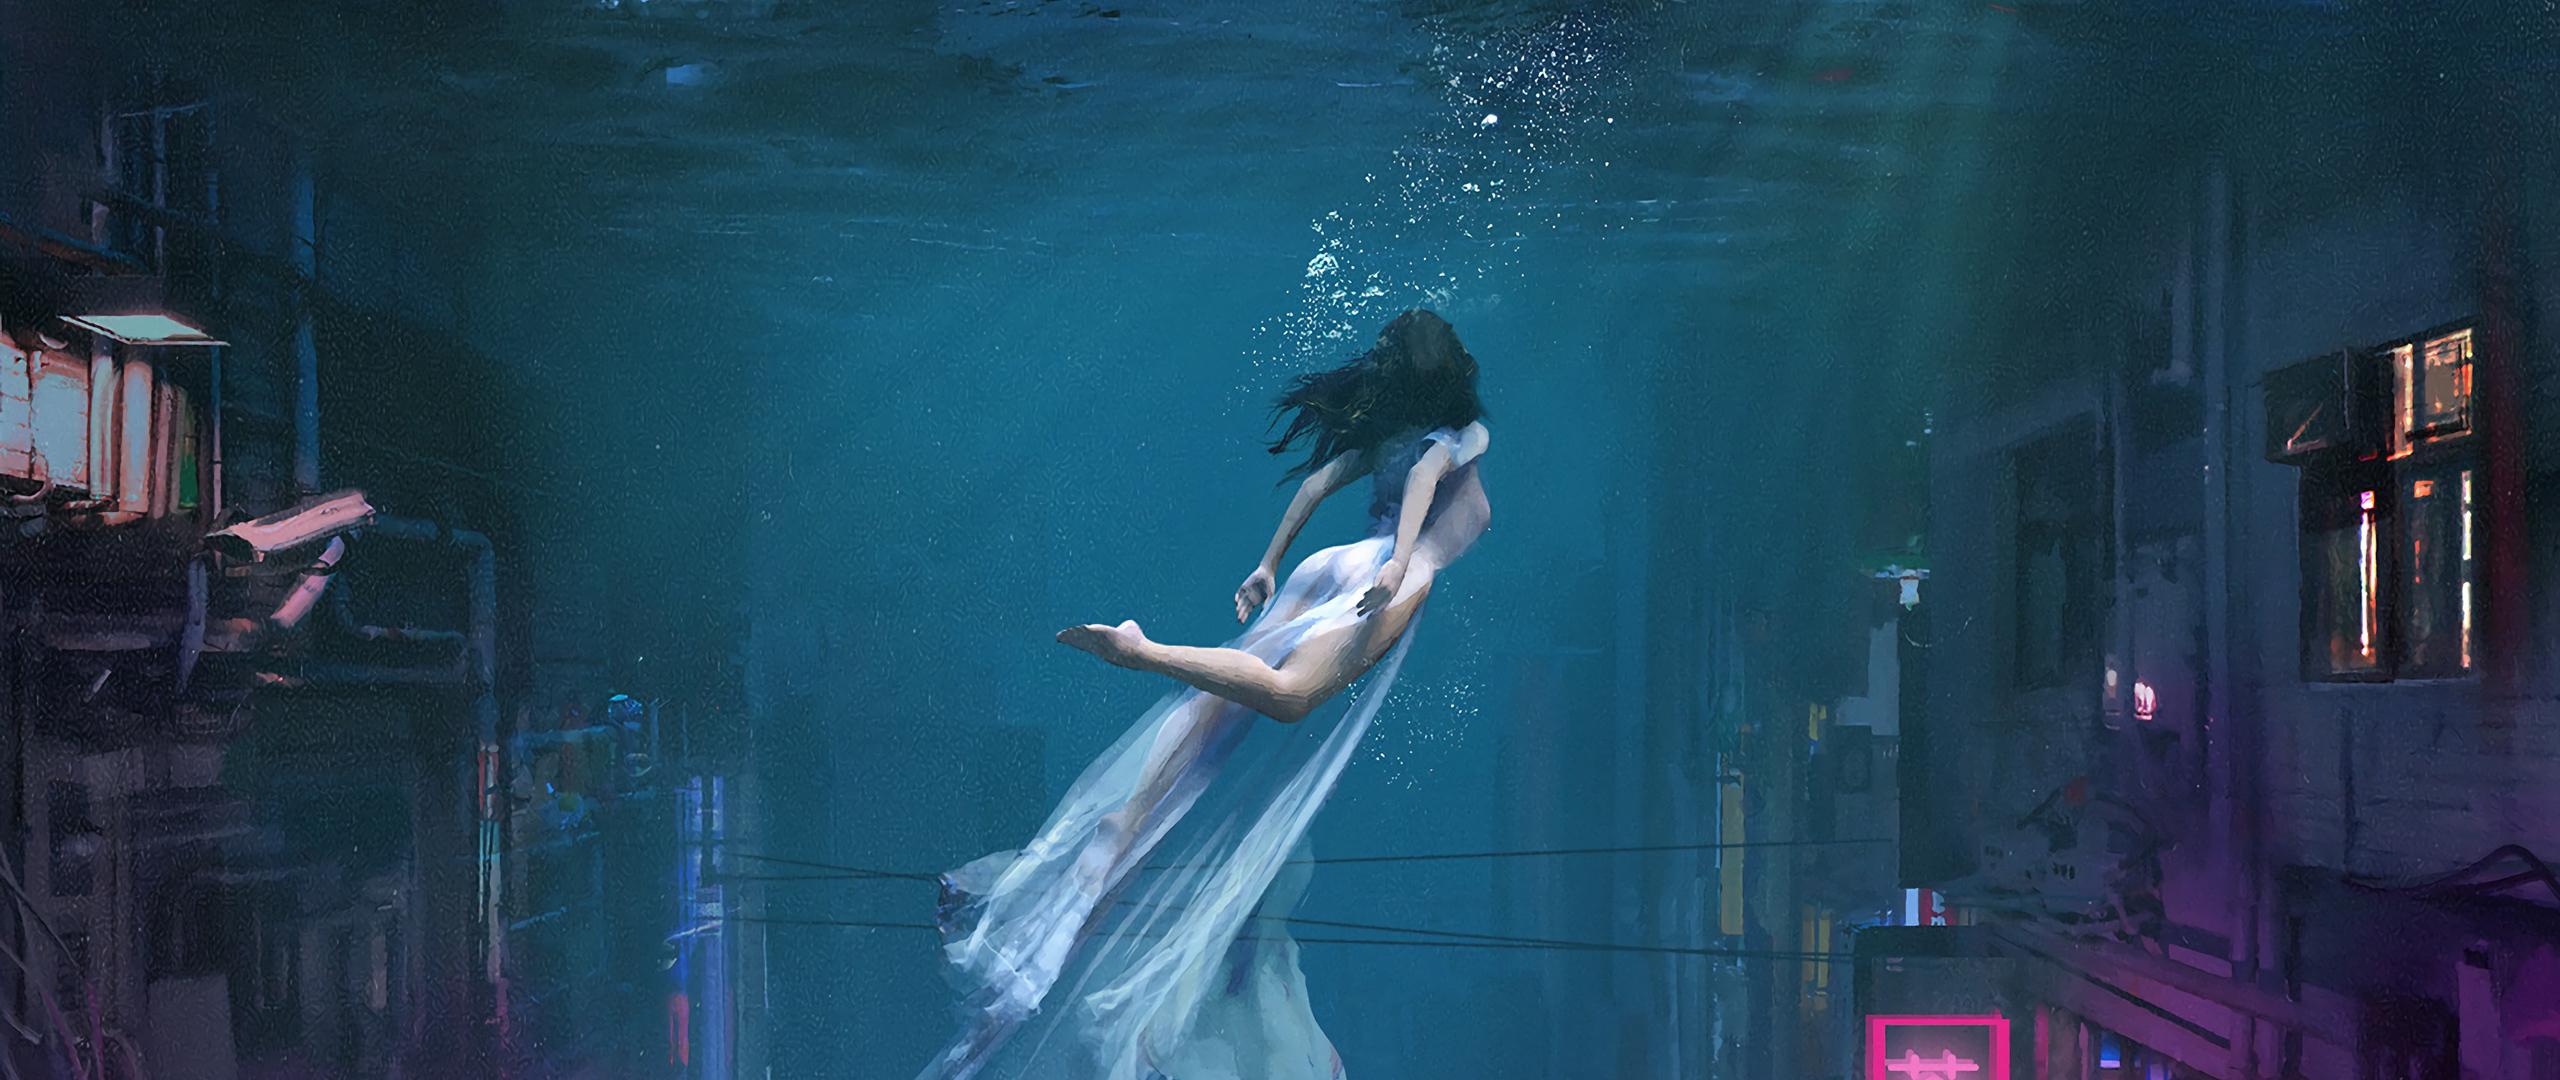 deadlife-mermaid-4k-0r.jpg